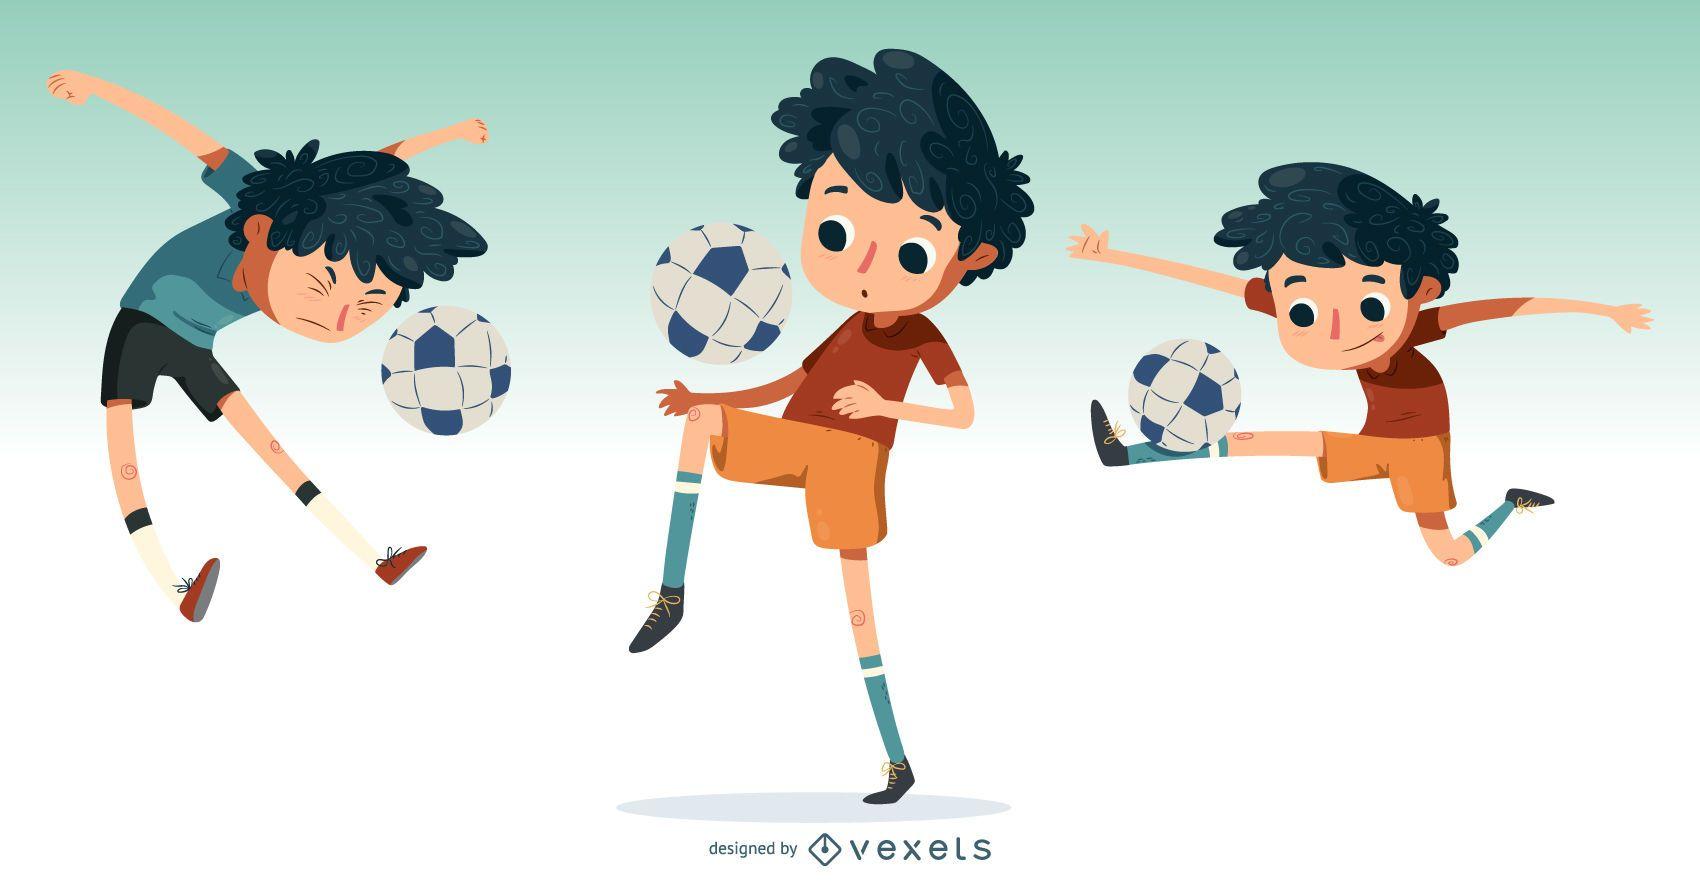 Little Boy Playing Soccer Illustration